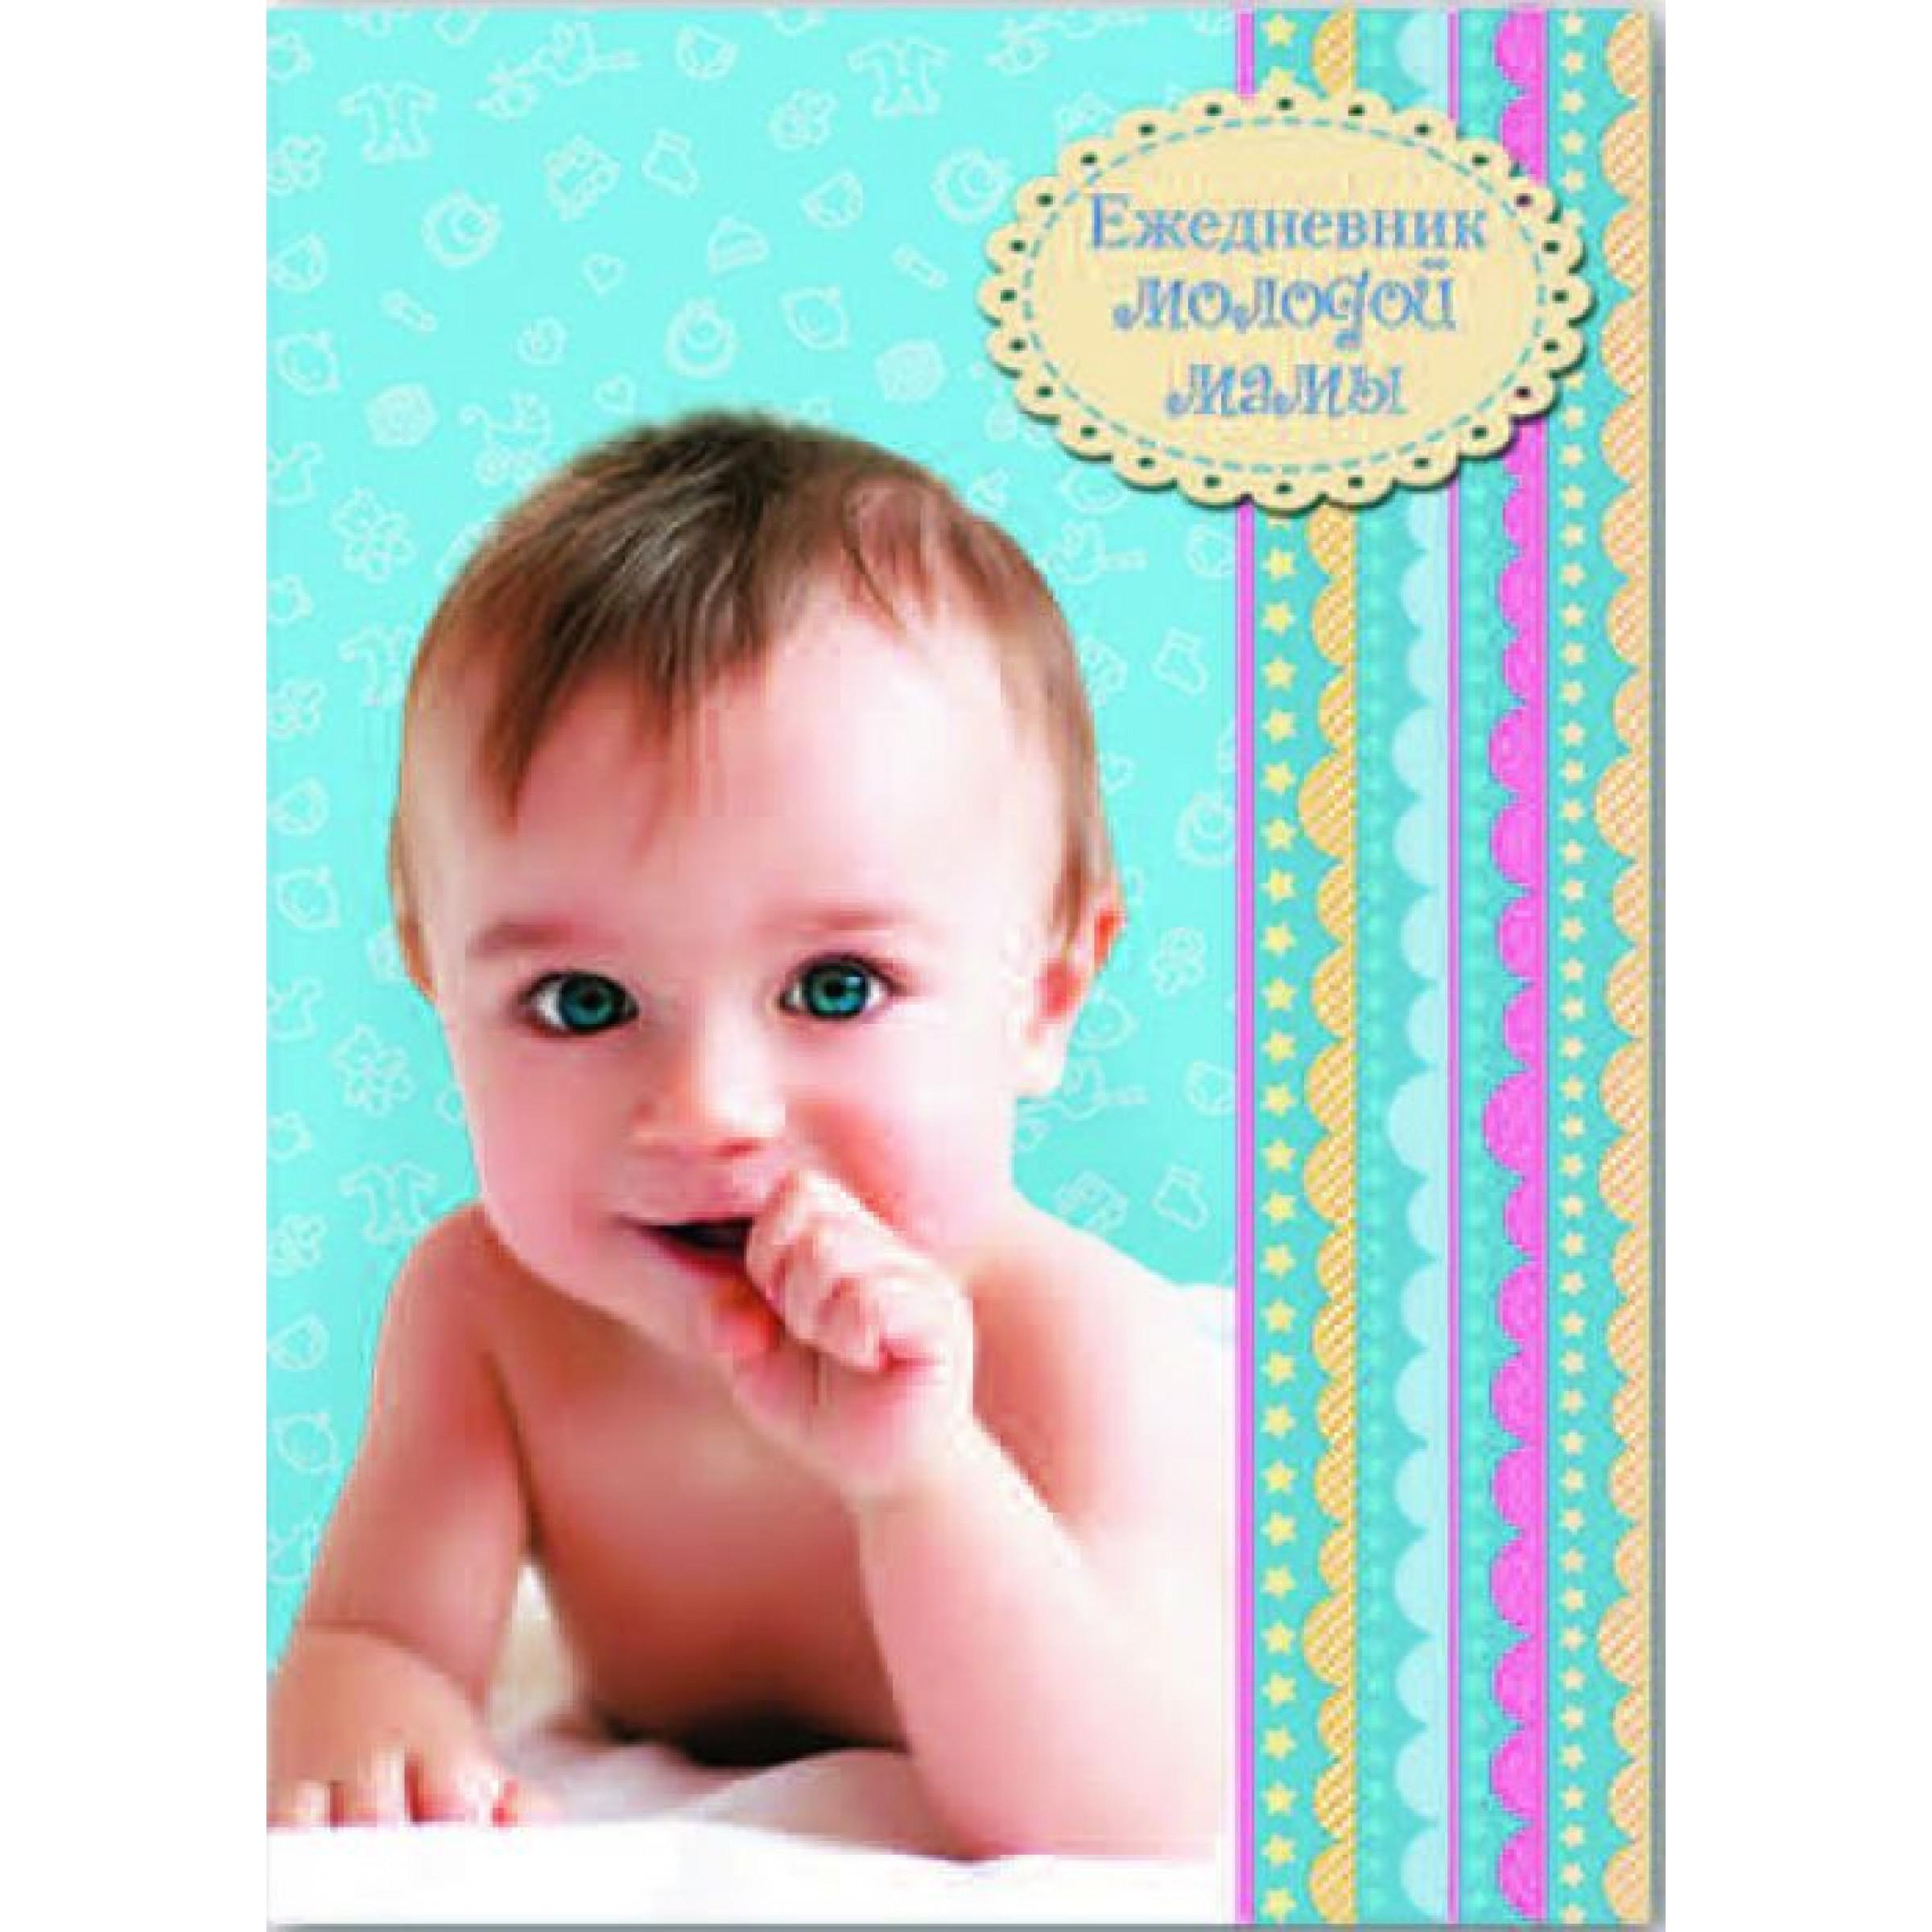 "Ежедневник молодой мамы ""Веселый малыш"", 105х148мм."